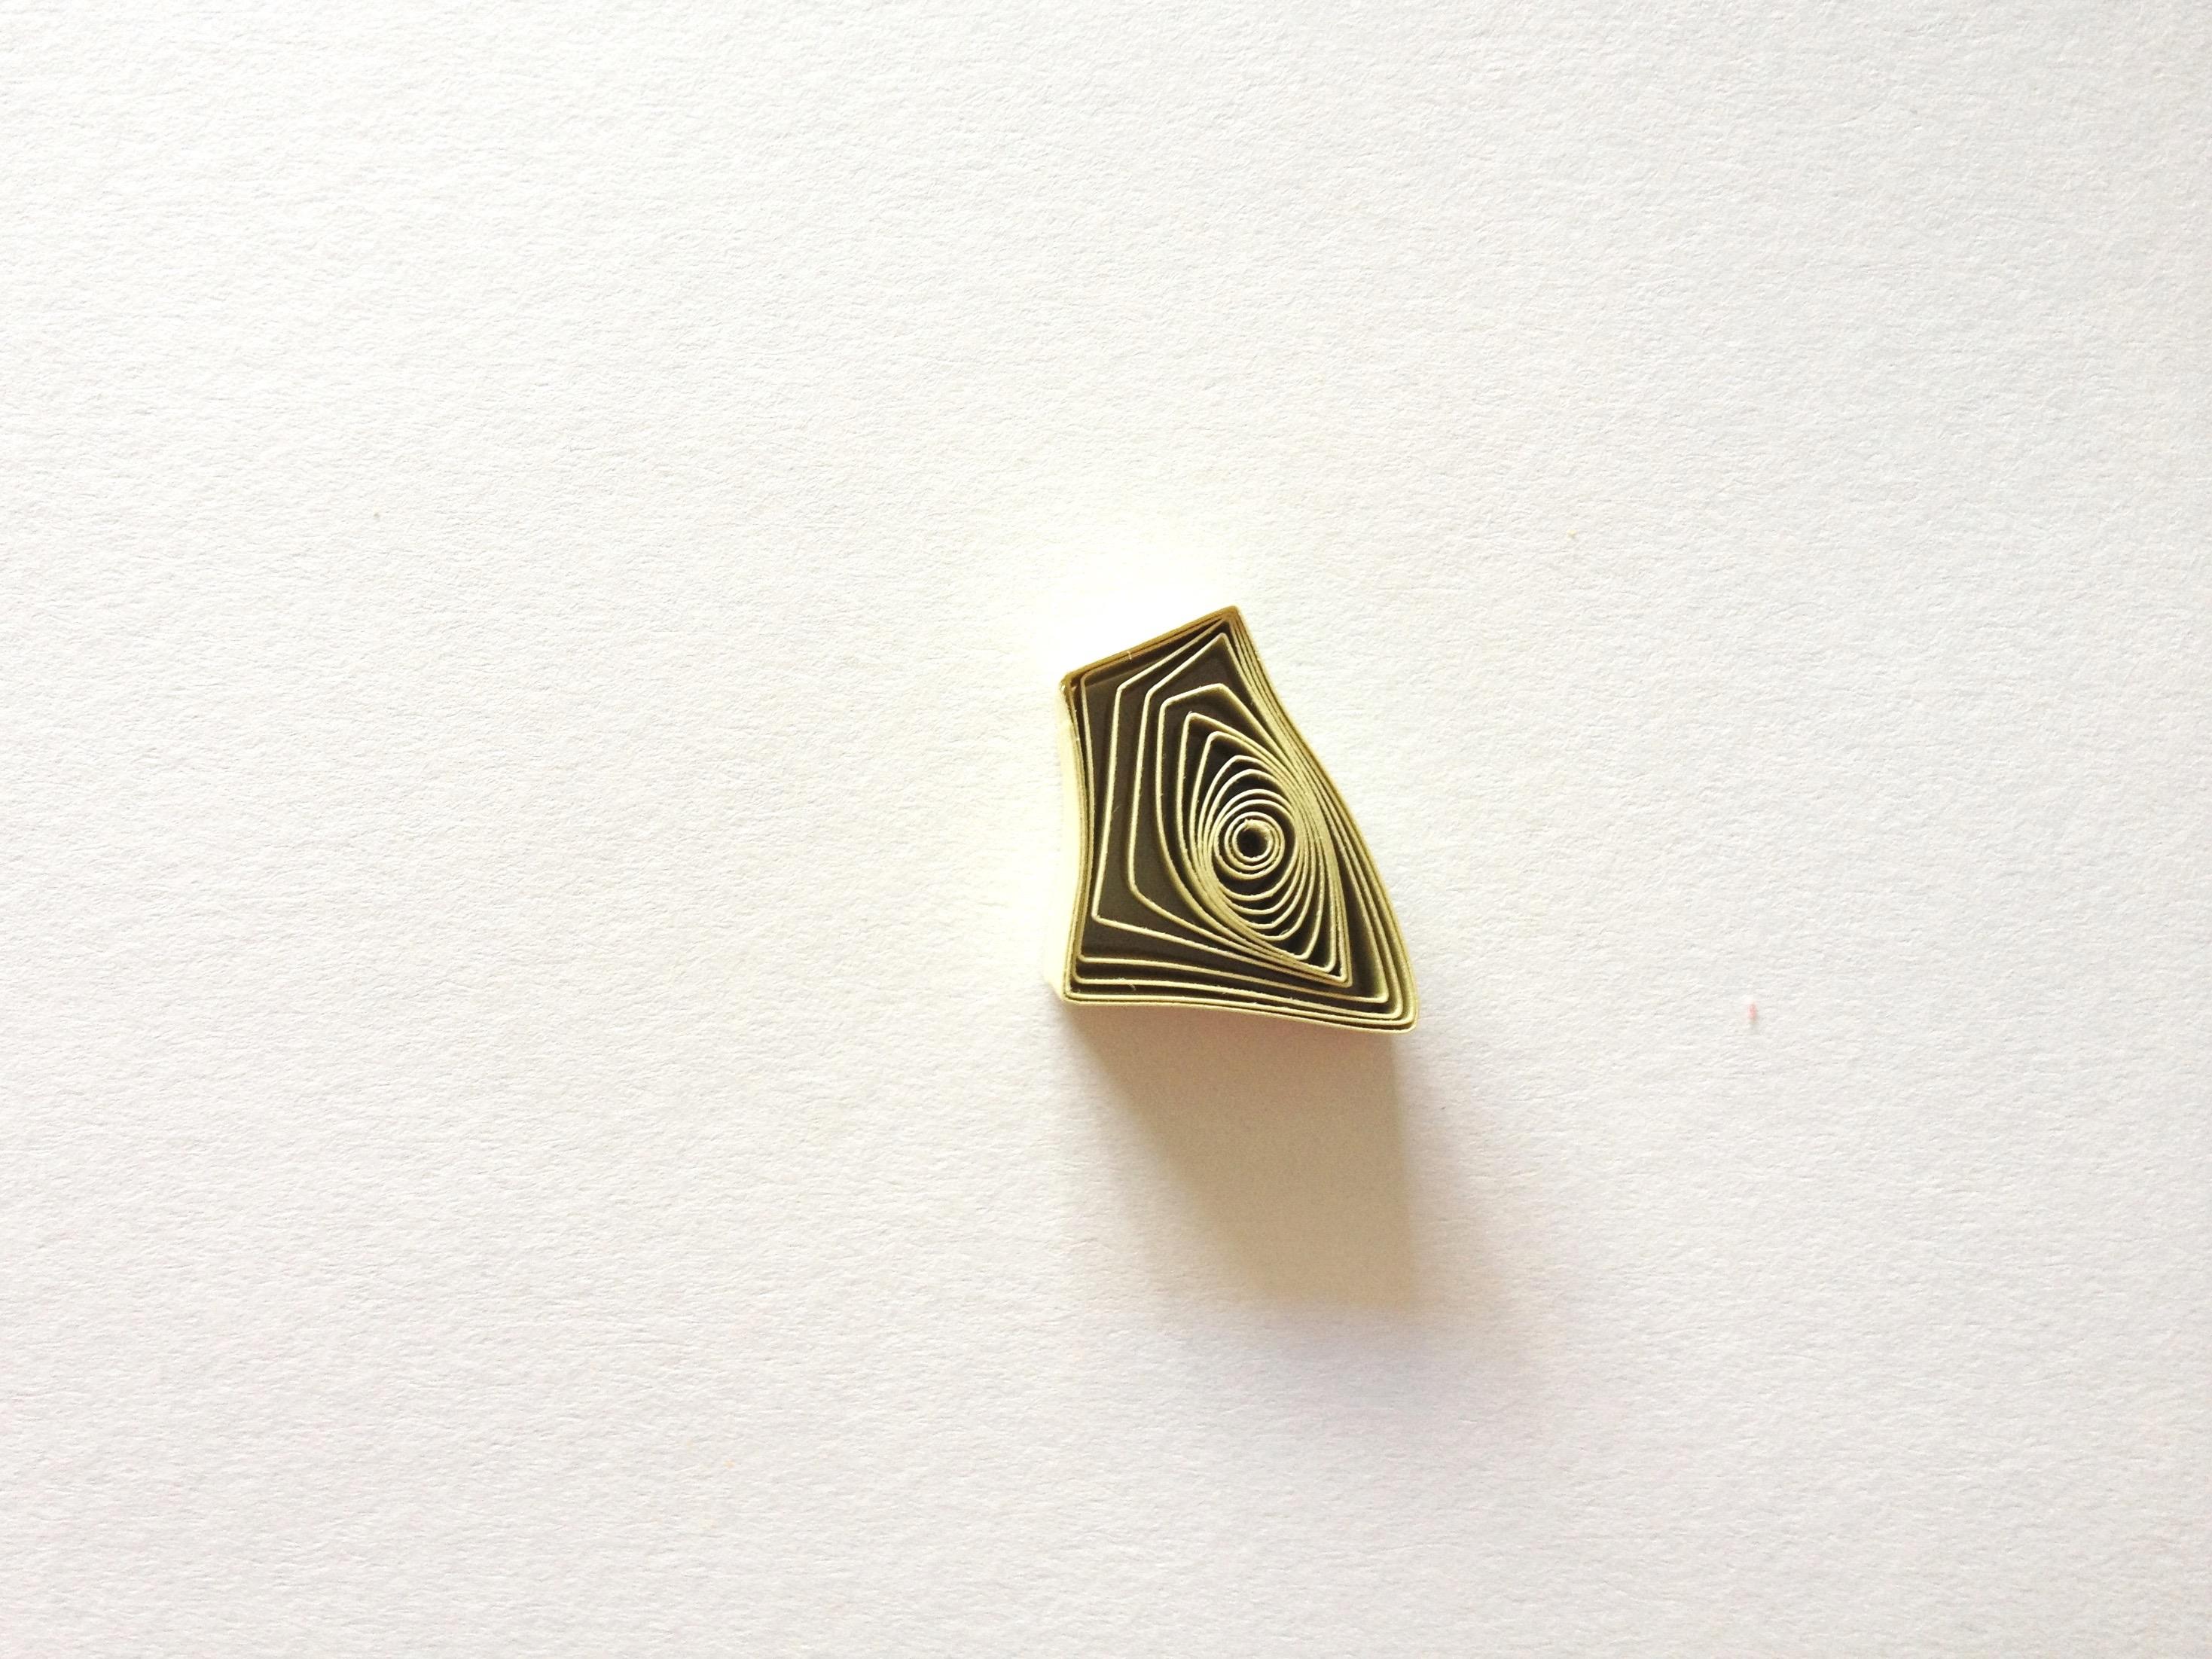 quadrilateral shape